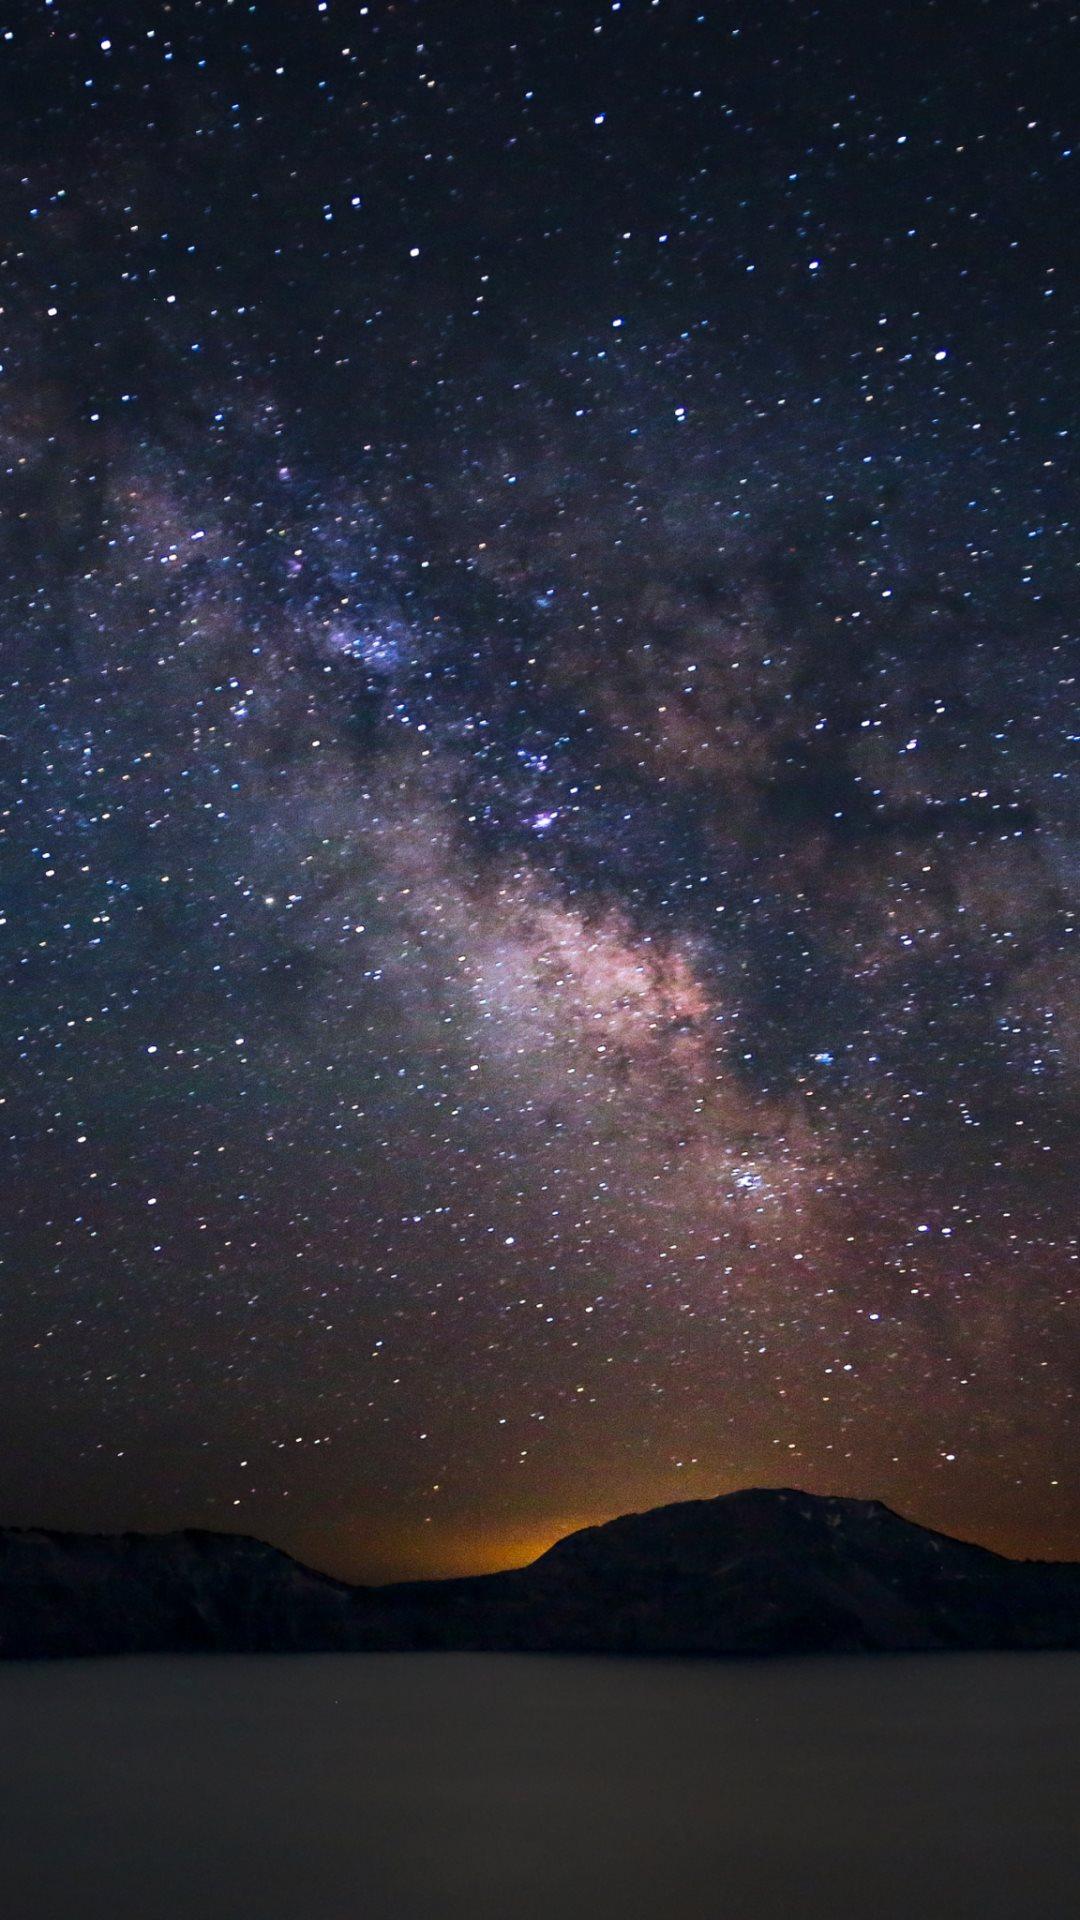 denser in middle night sky milky way galaxy - photo #6